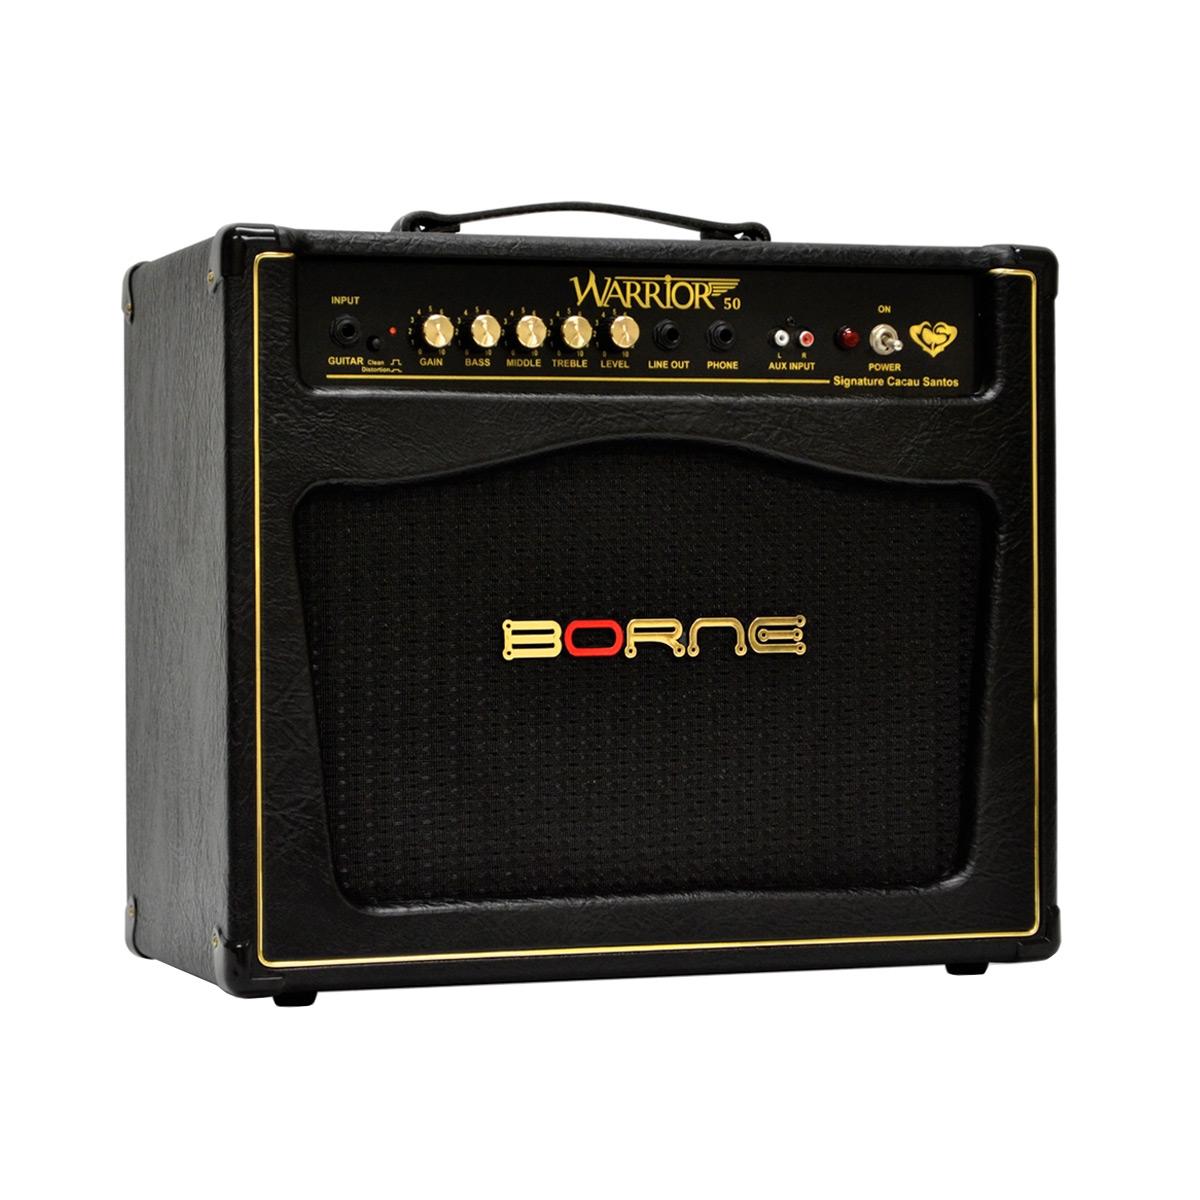 Amplificador Combo p/ Guitarra 50W Warrior 50 Preto - Borne